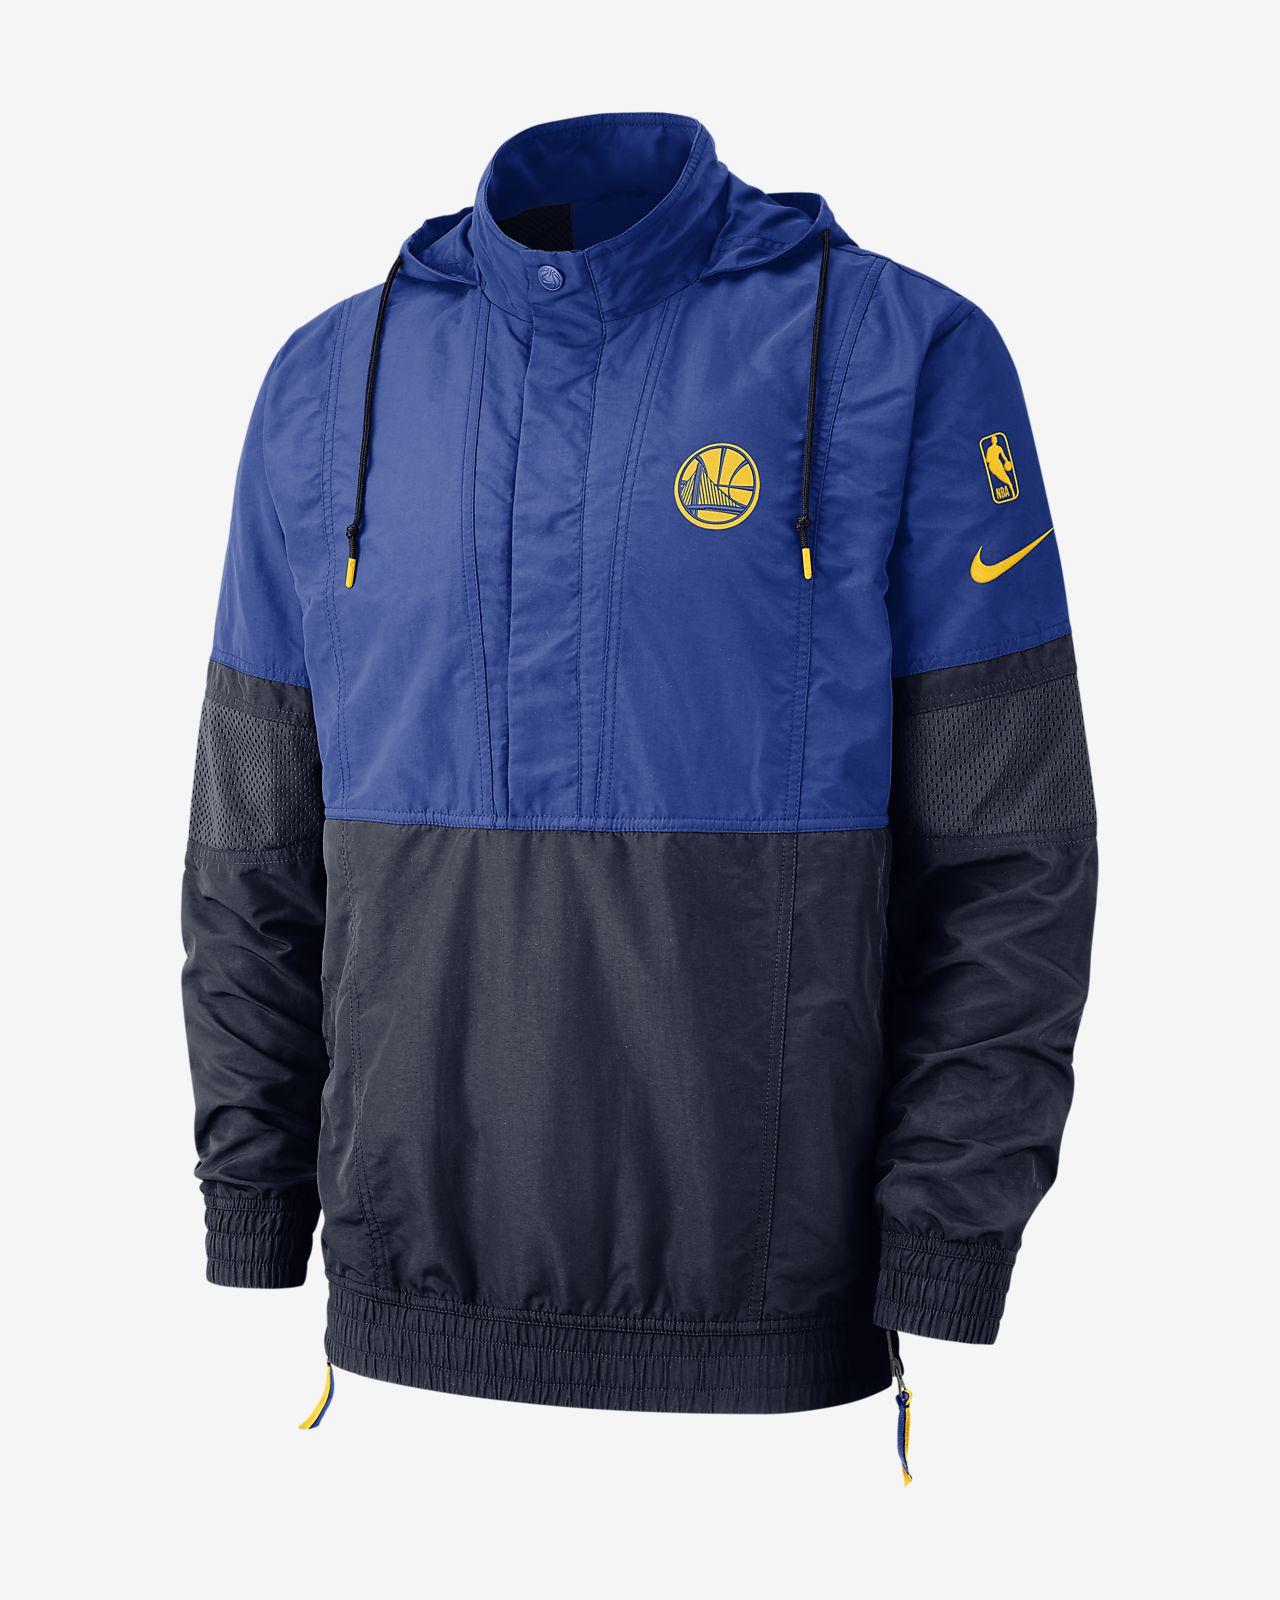 Golden State Warriors Nike Courtside Men's Hooded NBA Jacket